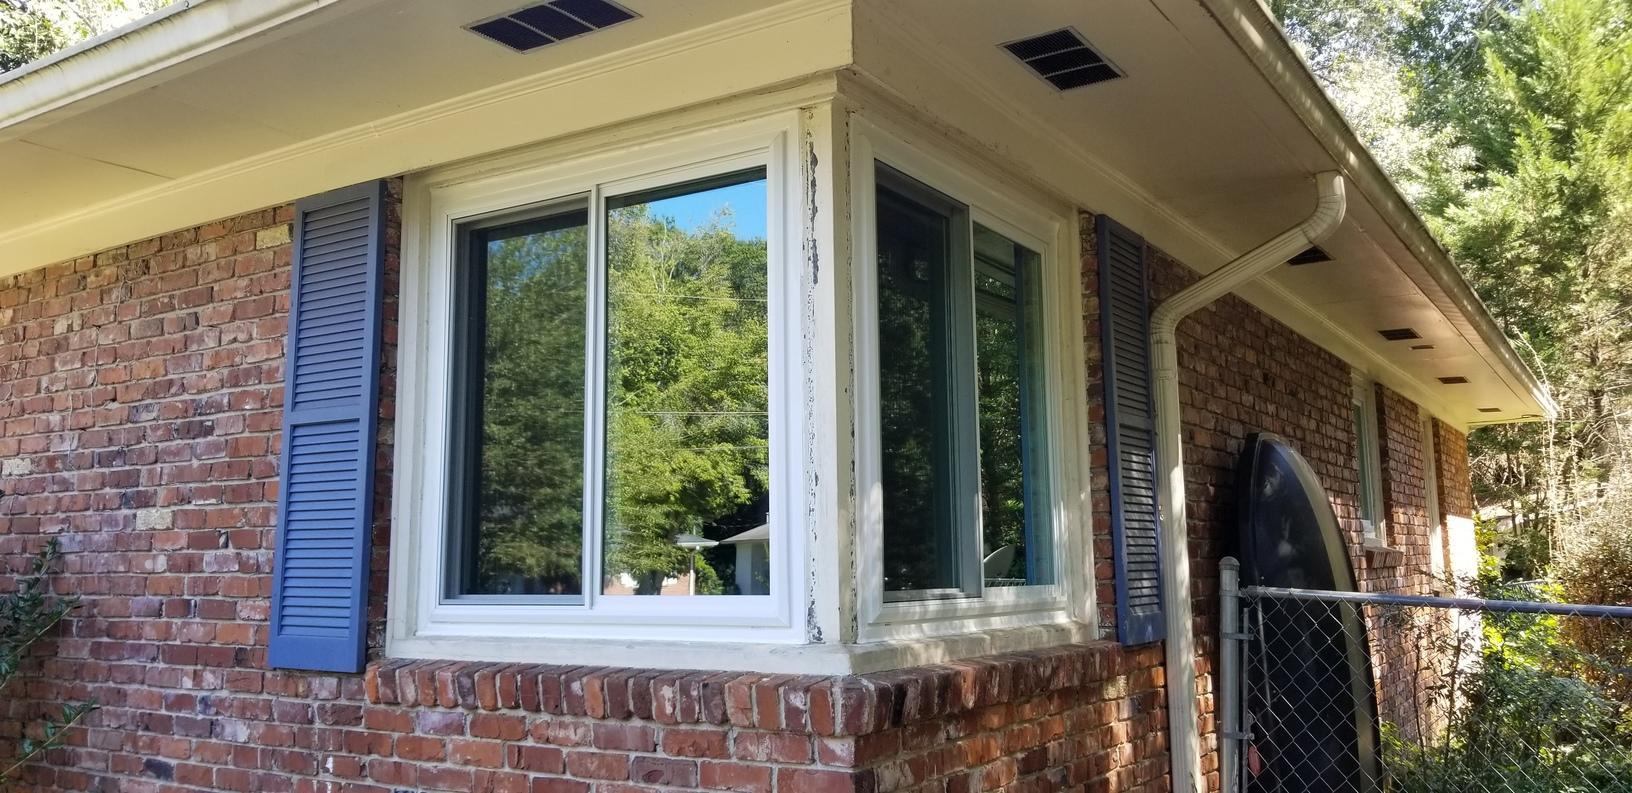 Corner Window - After